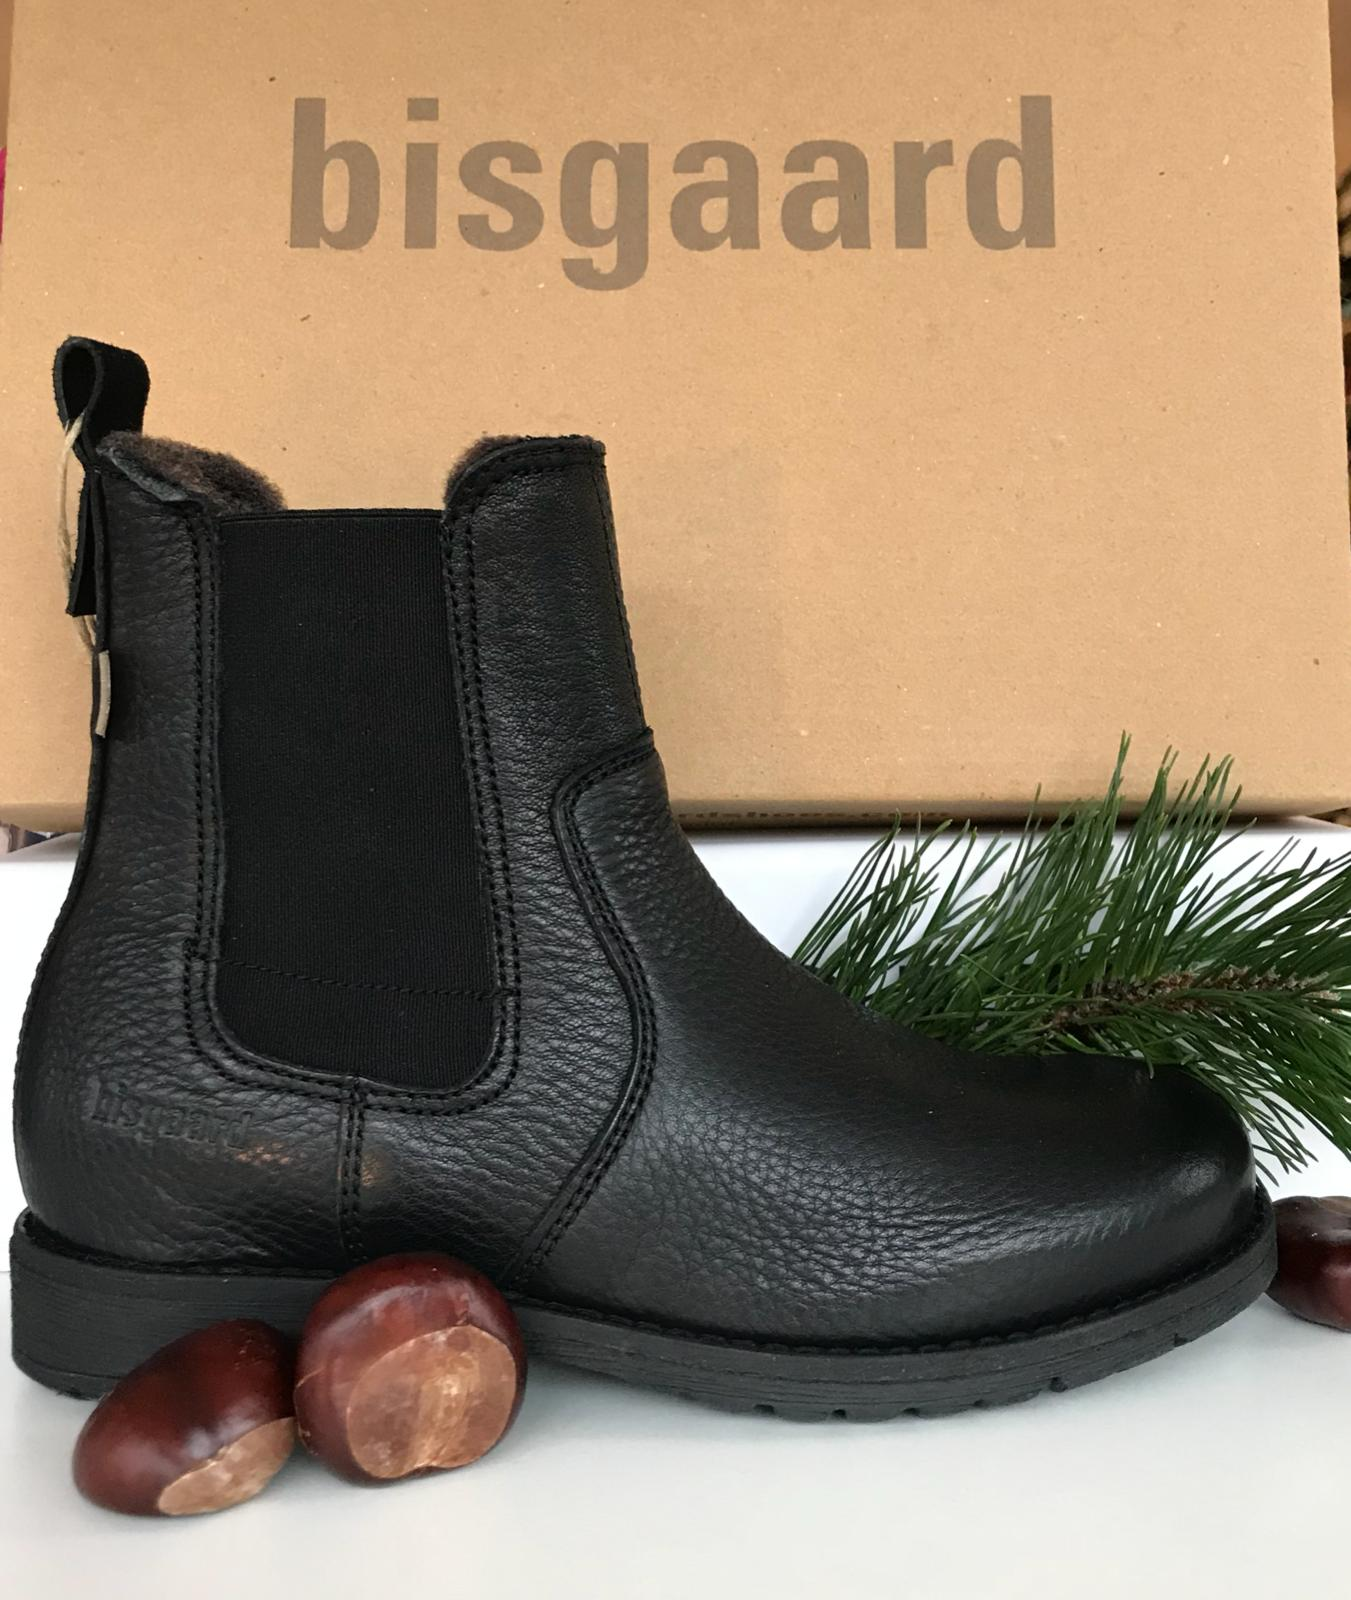 bisgaard-10-2018-01